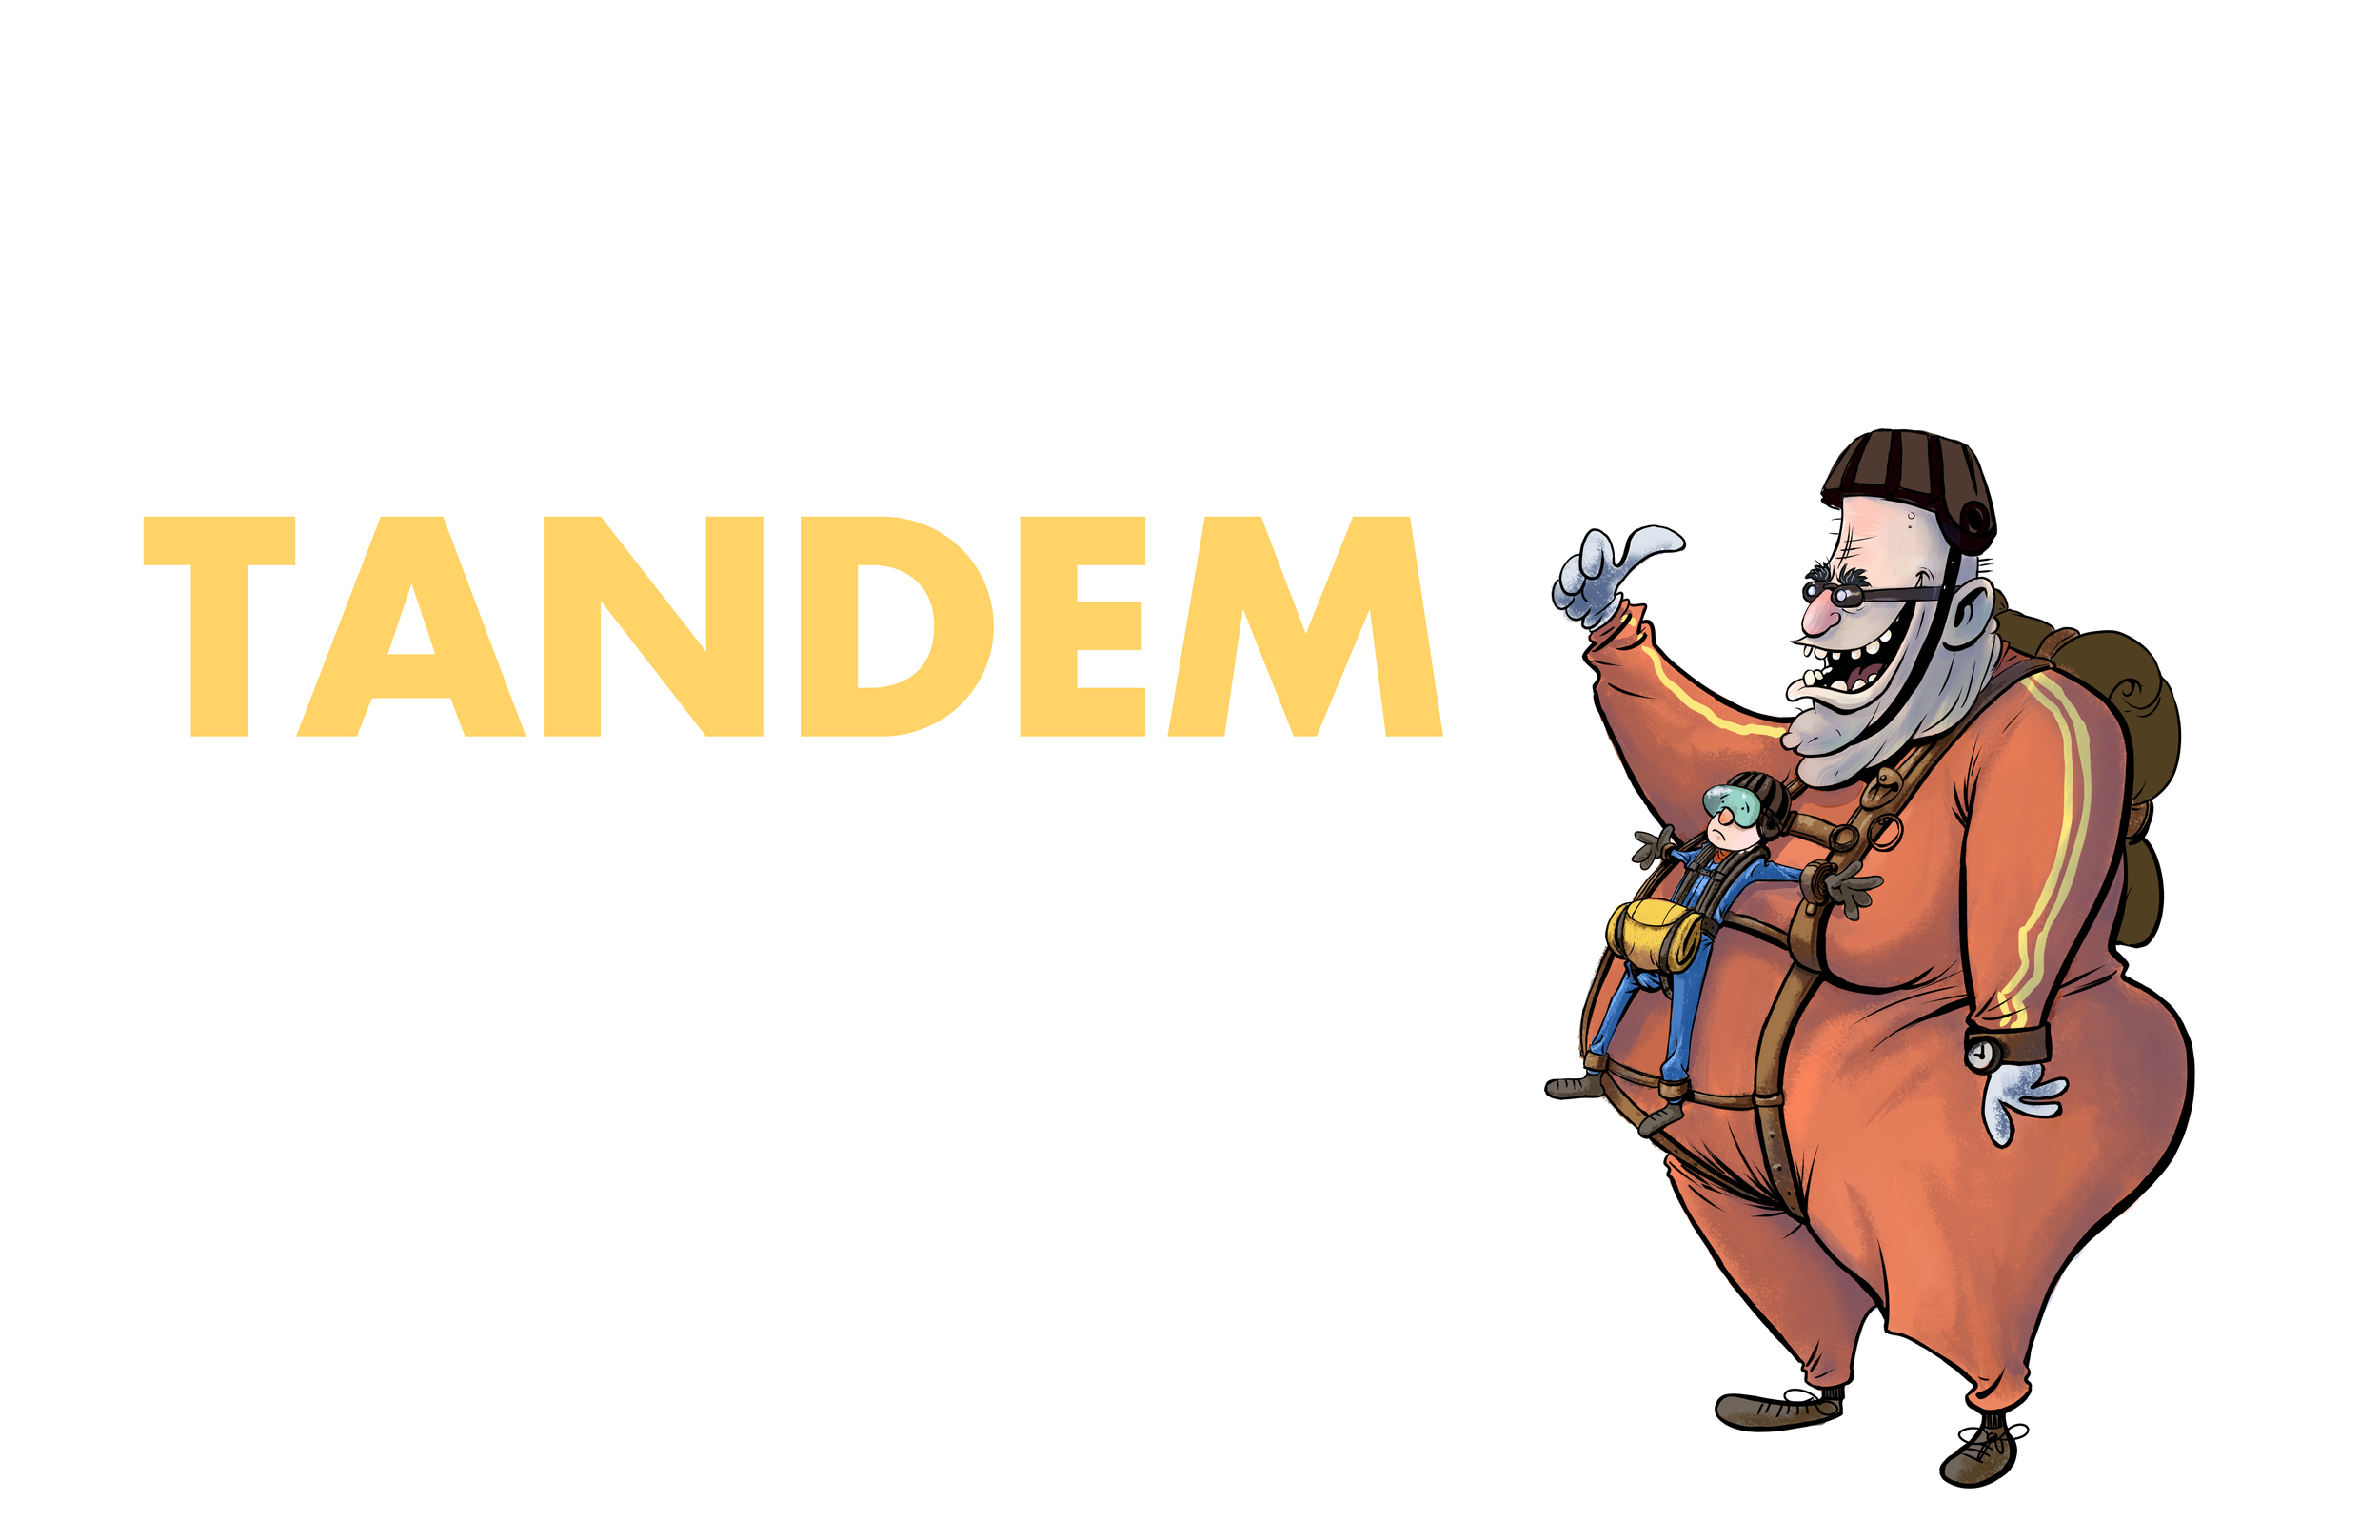 Tandem_001.jpg